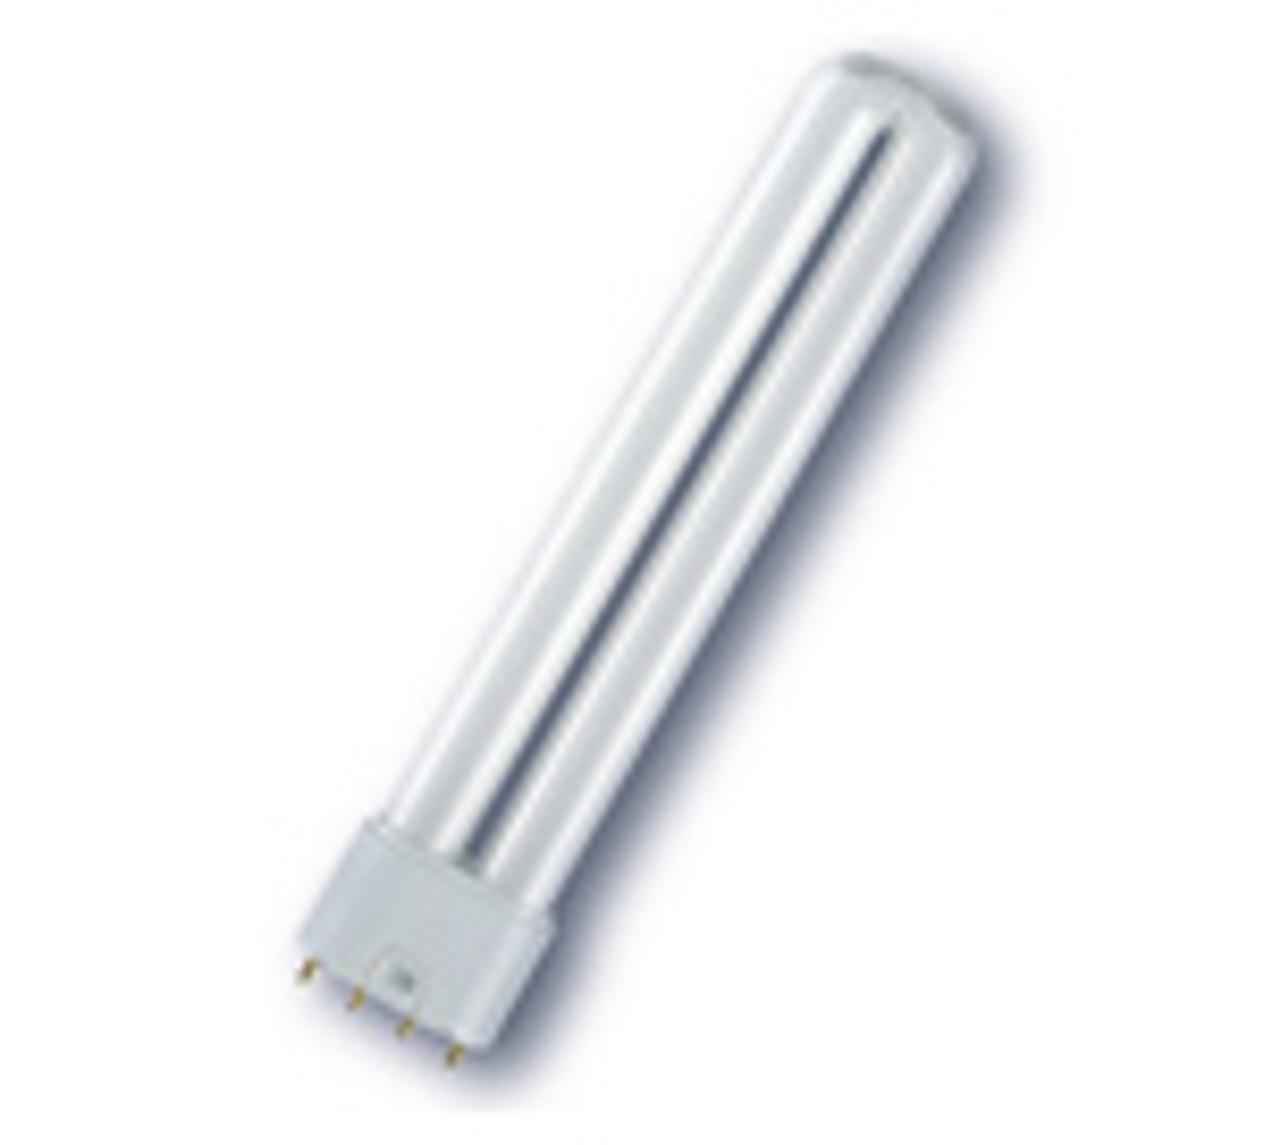 Dulux L 2G 11 Base 40 W Fluorescent Bulbs (Lot of 6)